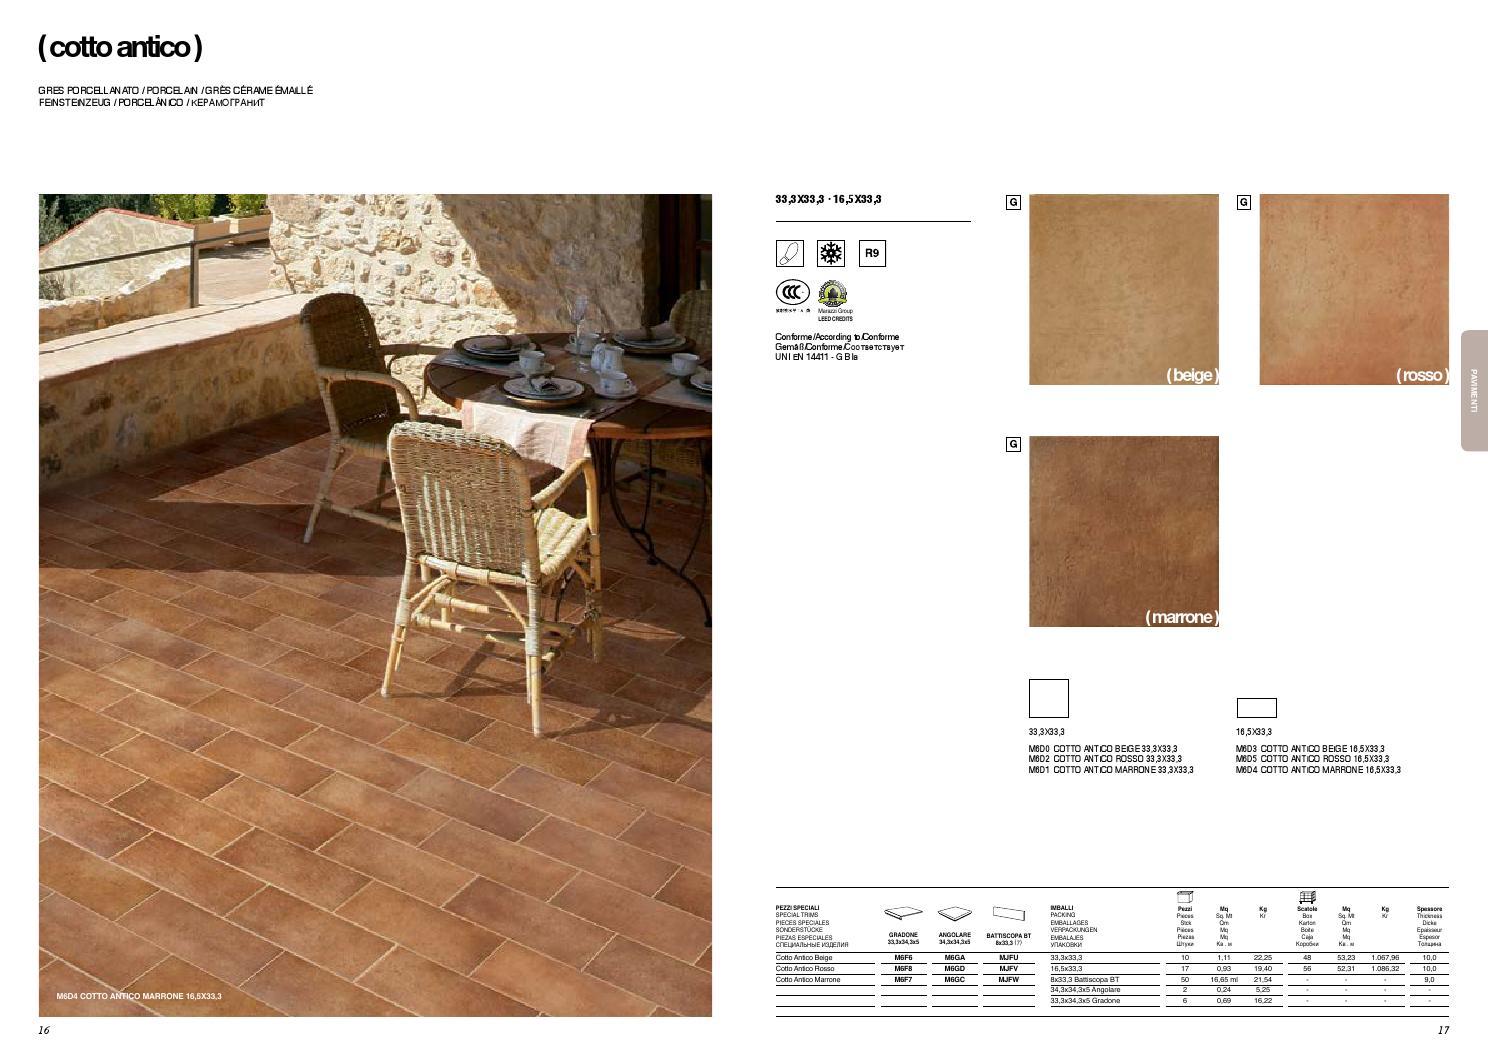 Marazzi italy contractors catalogue 2015 by iris issuu for Marazzi cotto antico